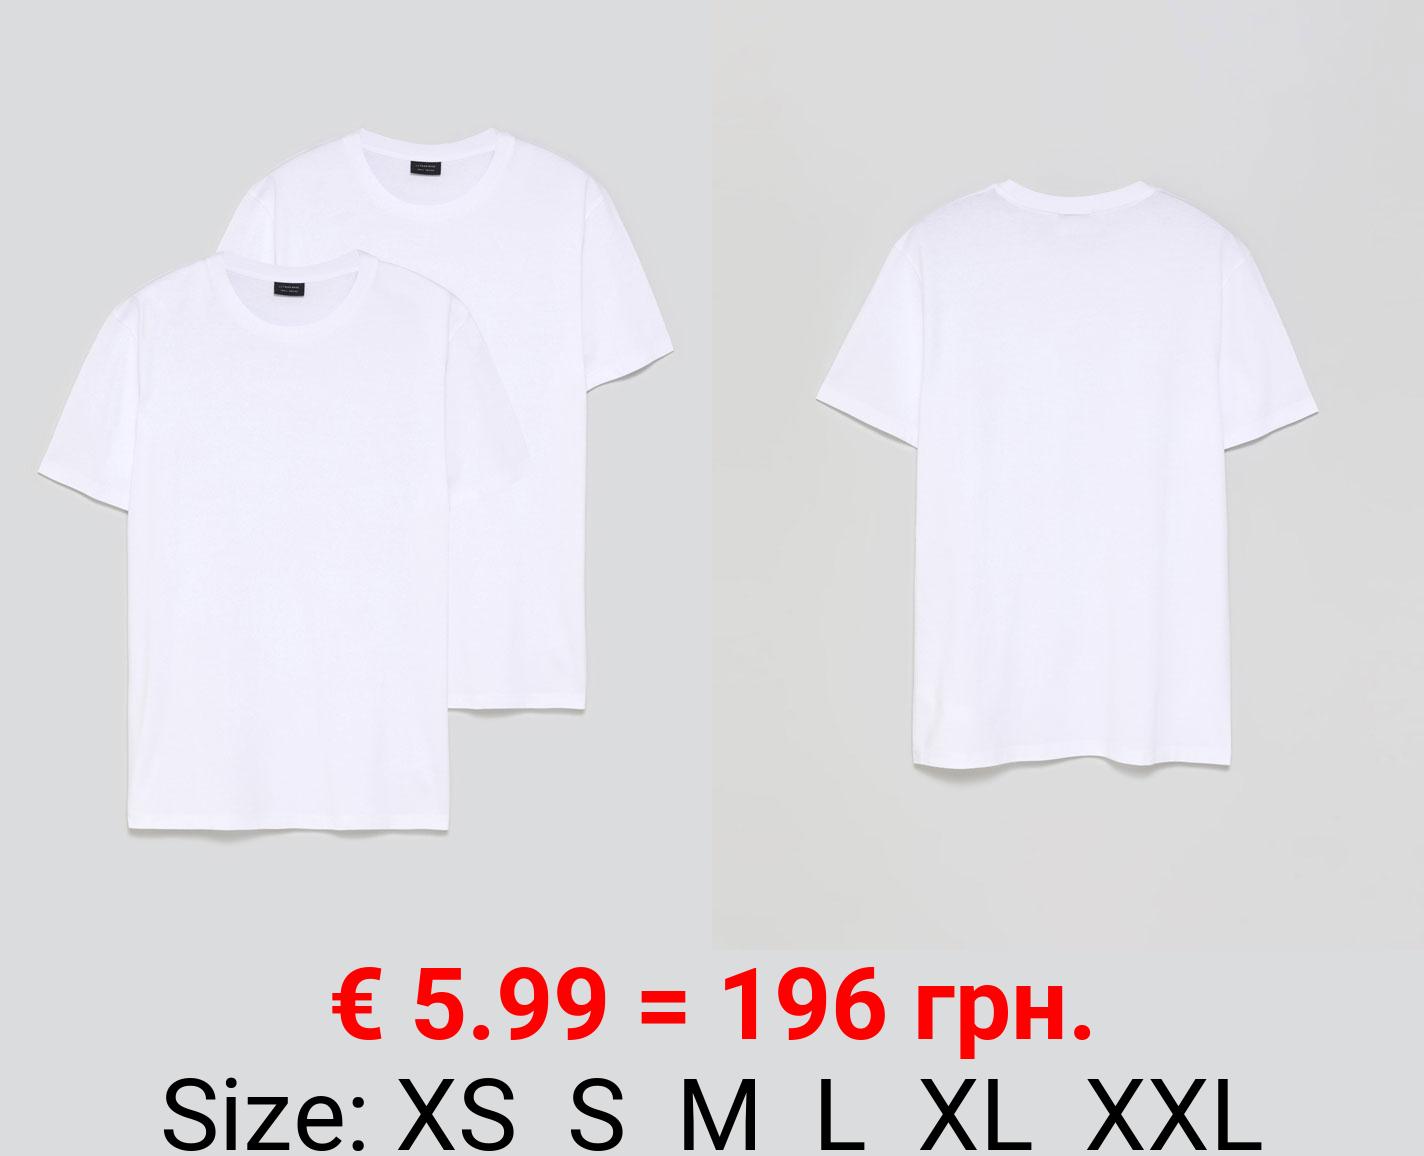 2-Pack of basic T-shirts